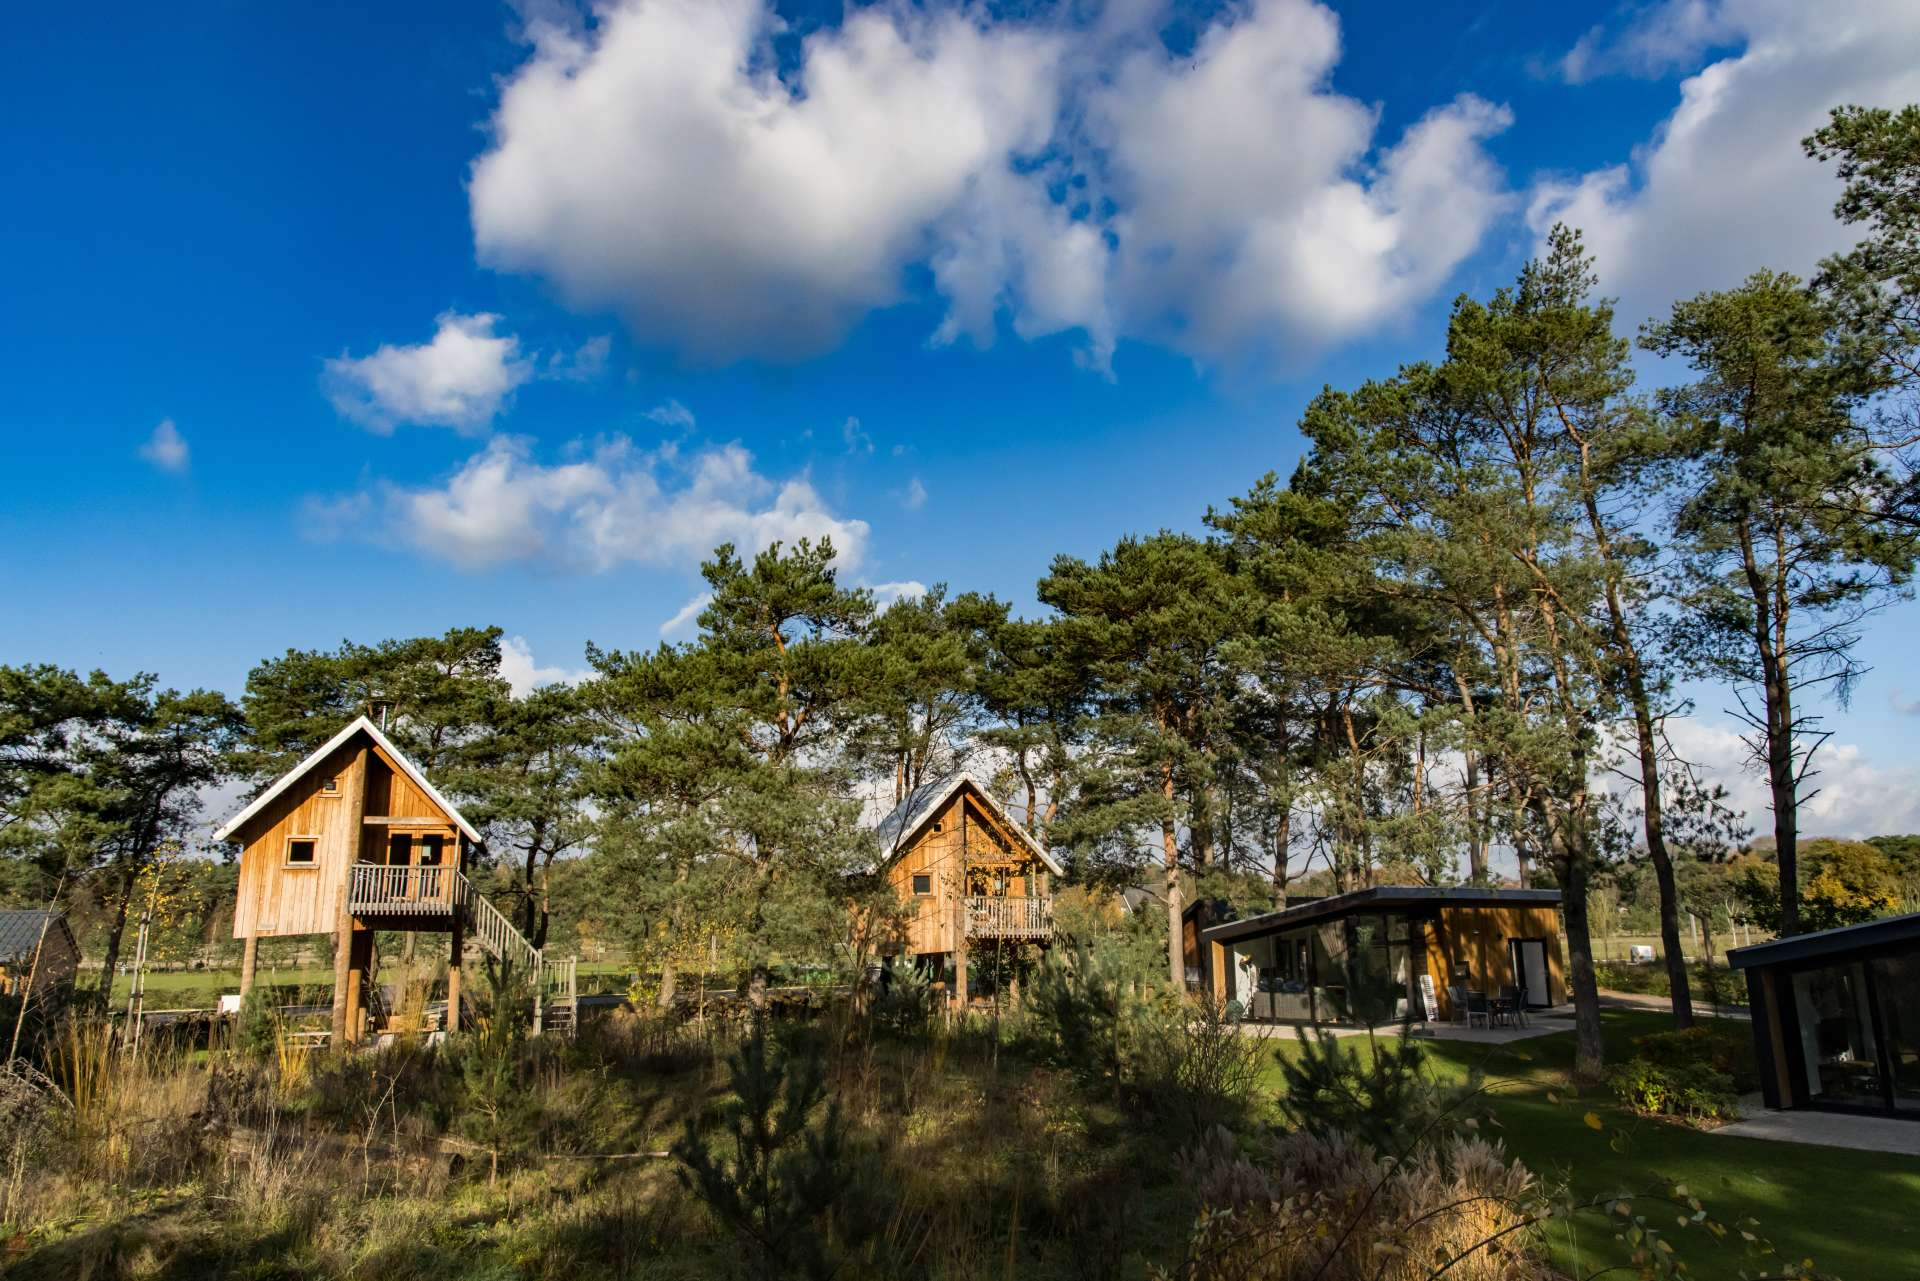 header-park-tree-house-europarcs-de-wije-werelt